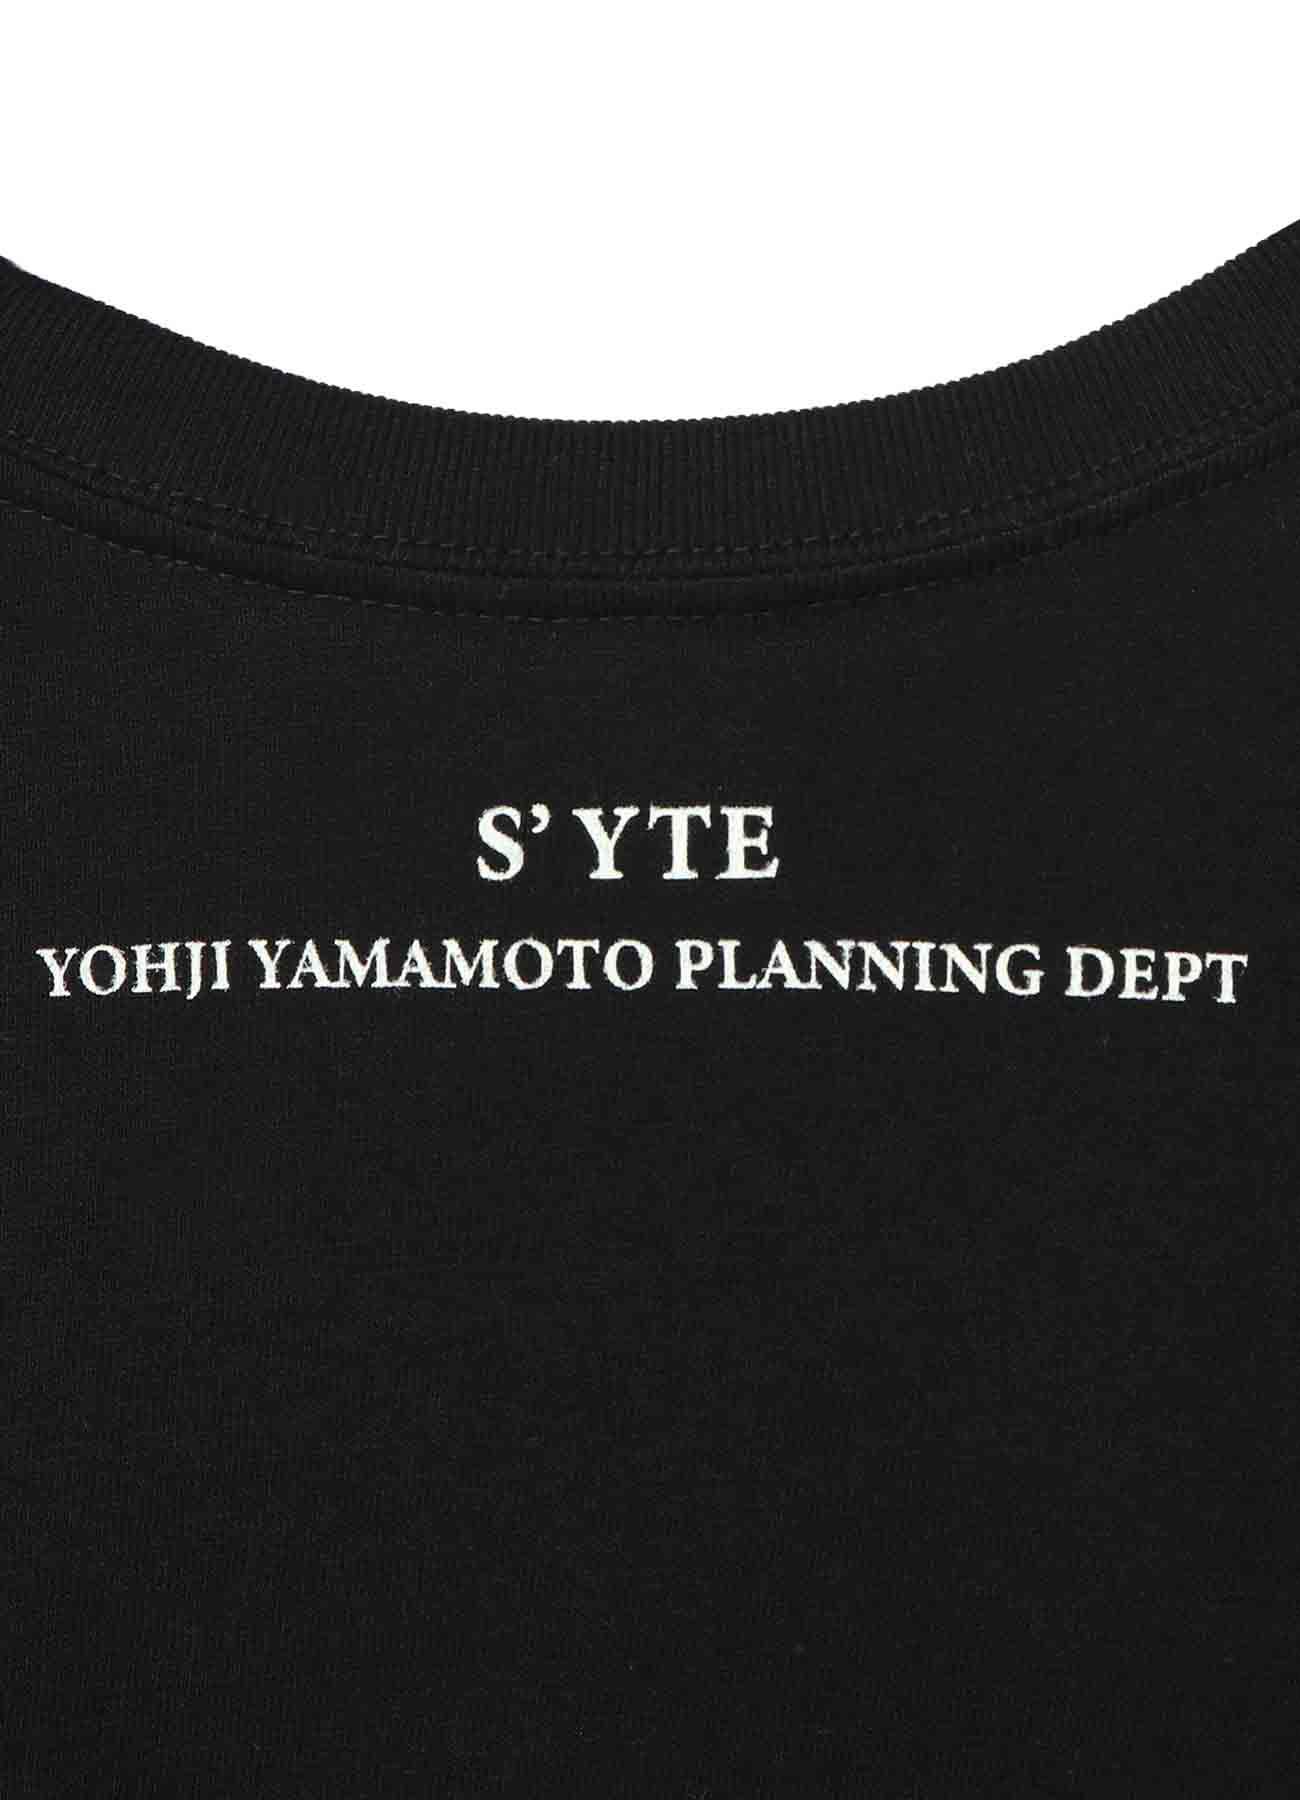 S'YTE 10TH「S'YTE BY S'YTE」Album Cover YY T-SHIRT